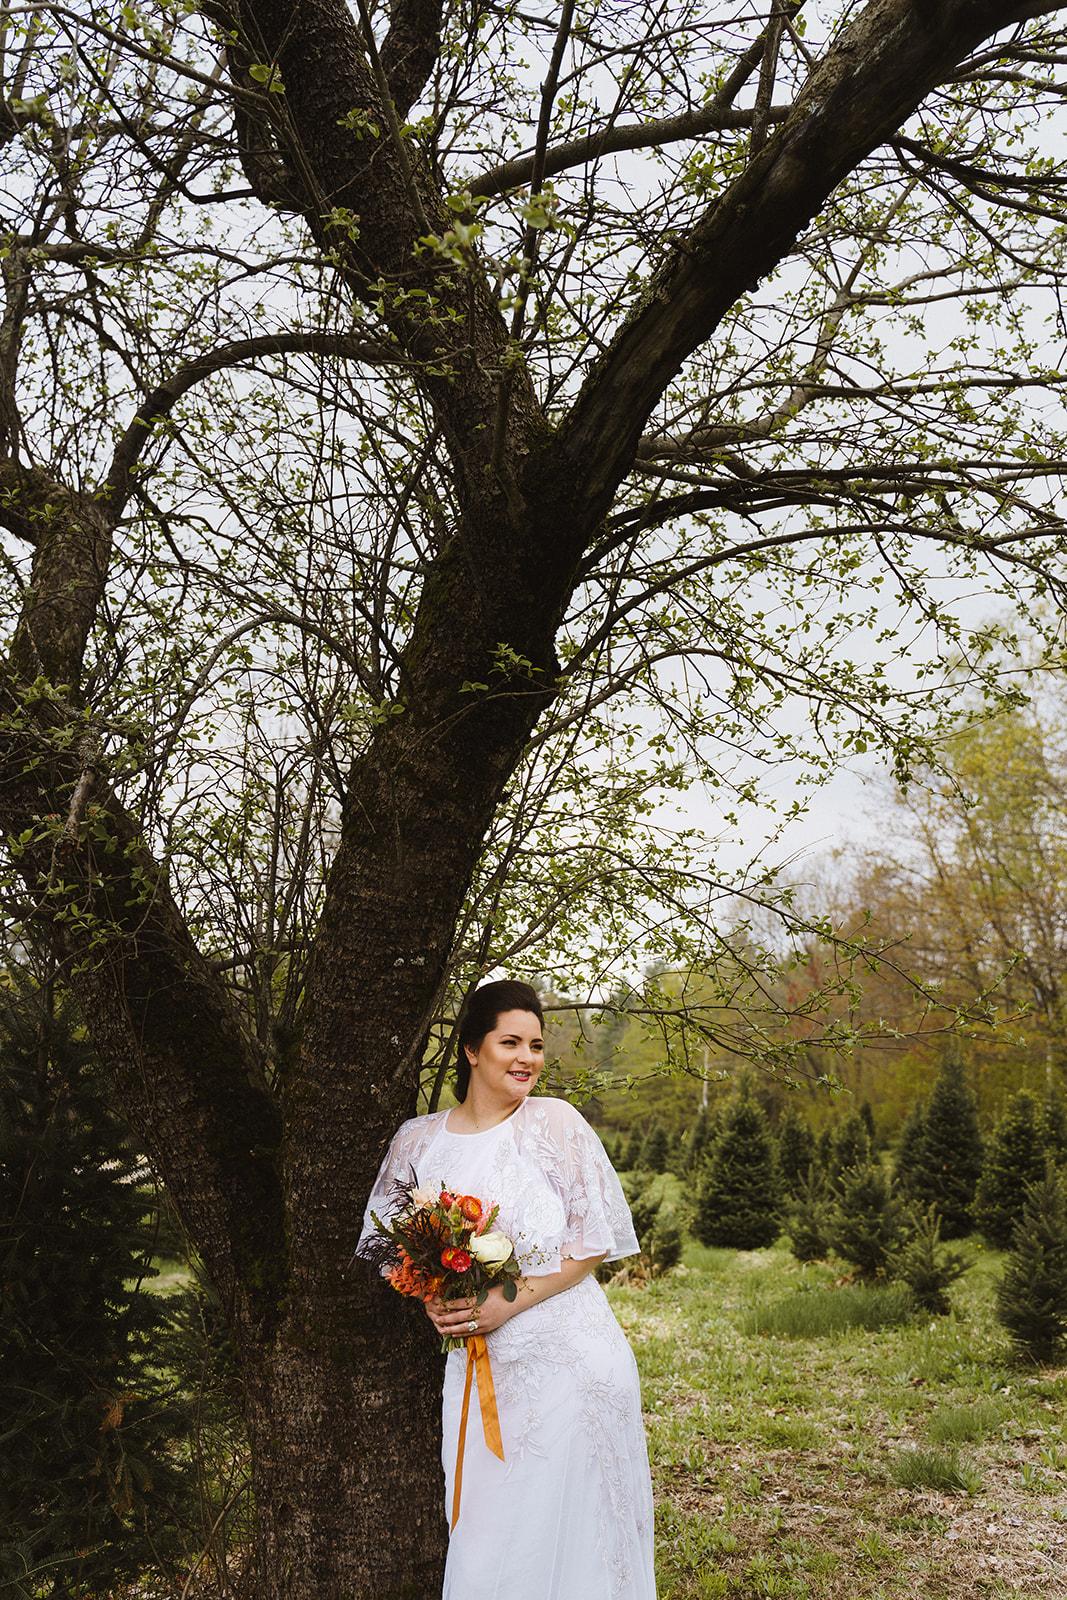 Tuckaway Tree Farm Lebanon Maine Wedding Inspiration 80